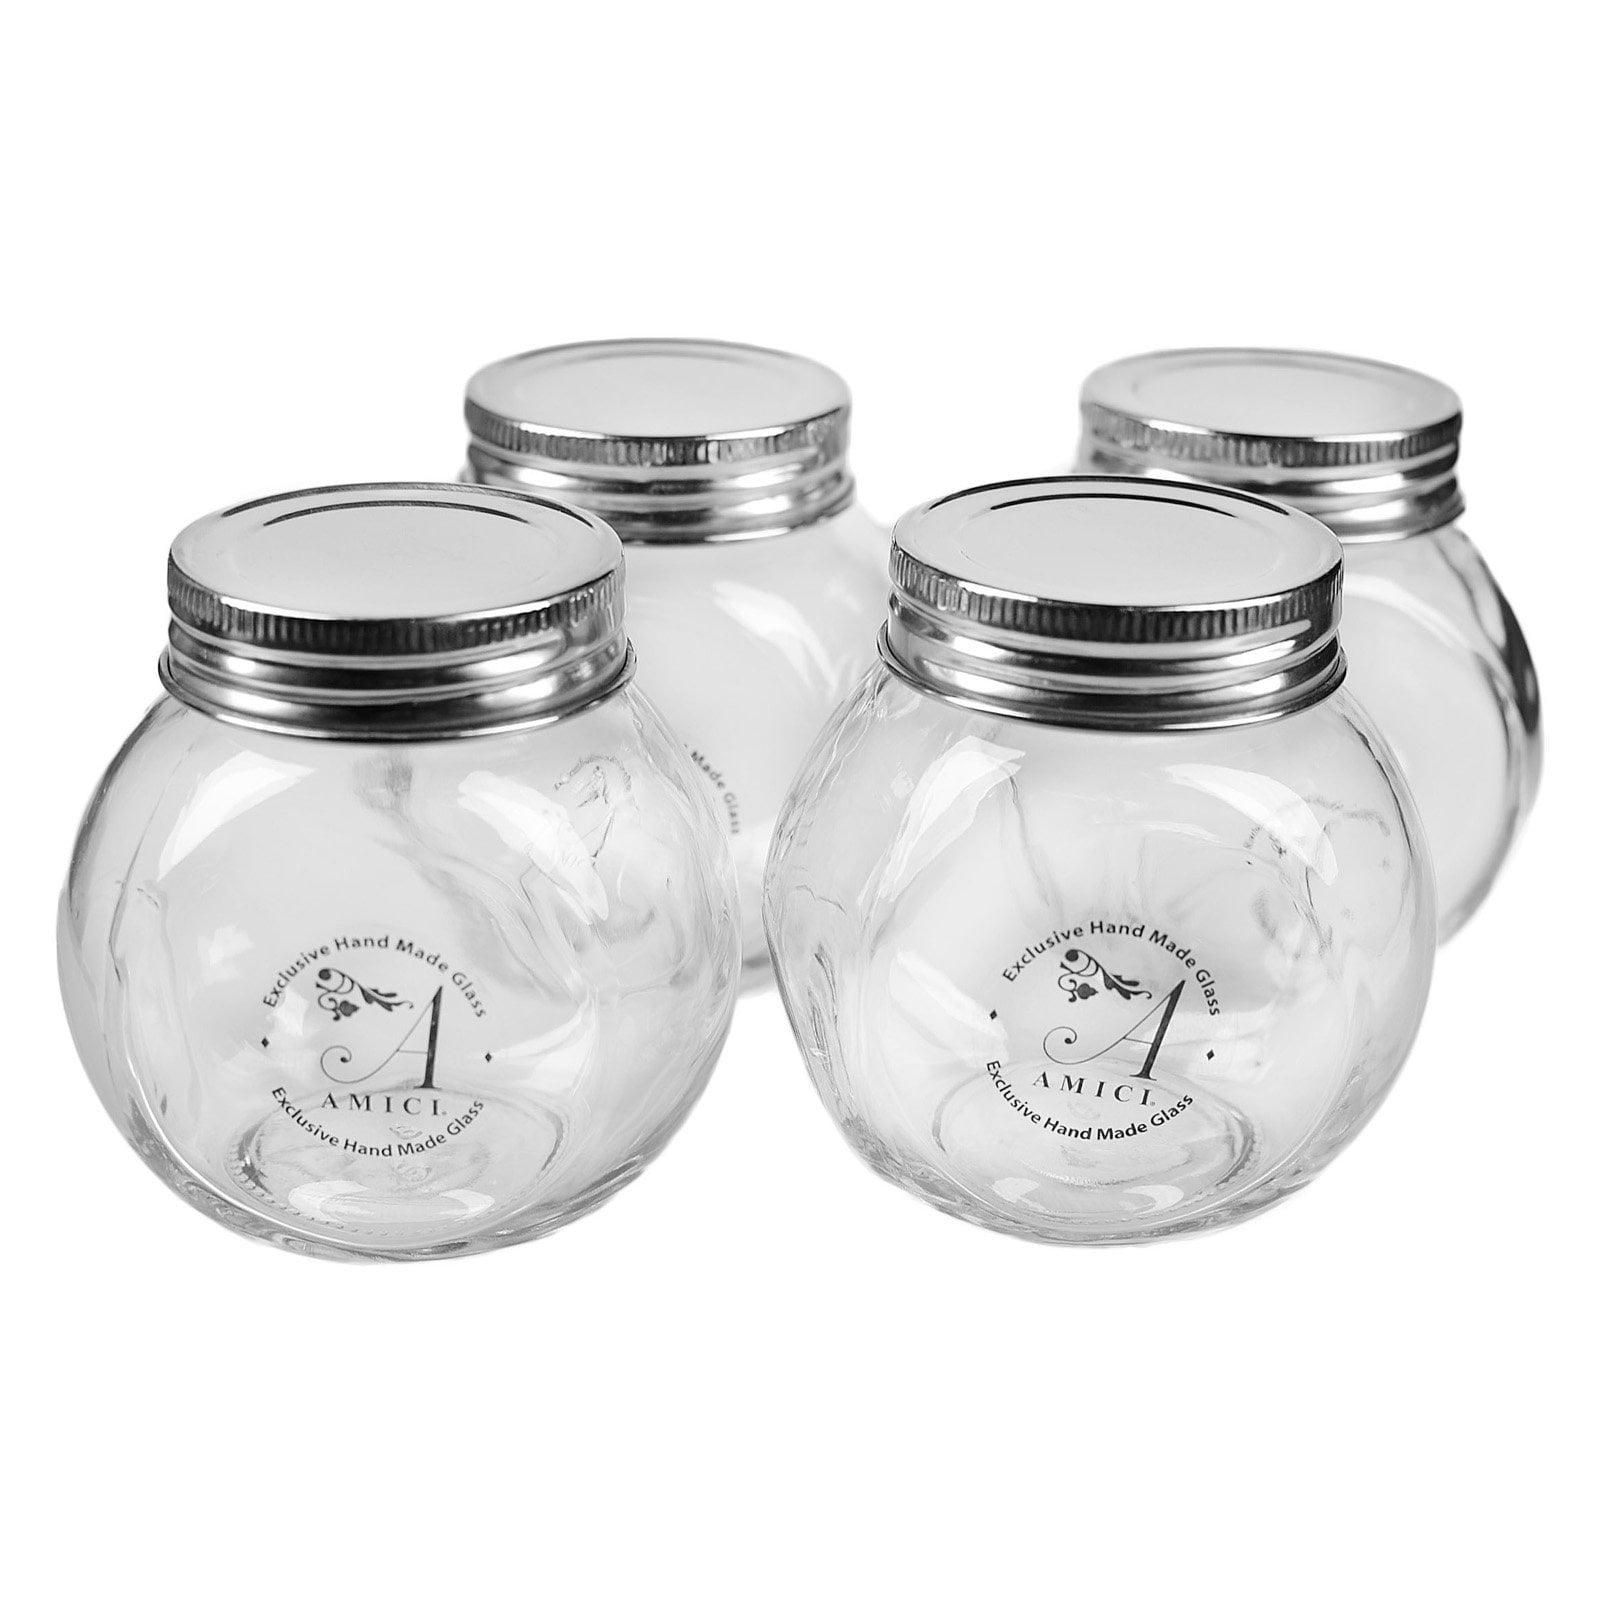 Global Amici Basic Spice Jars - Set of 12